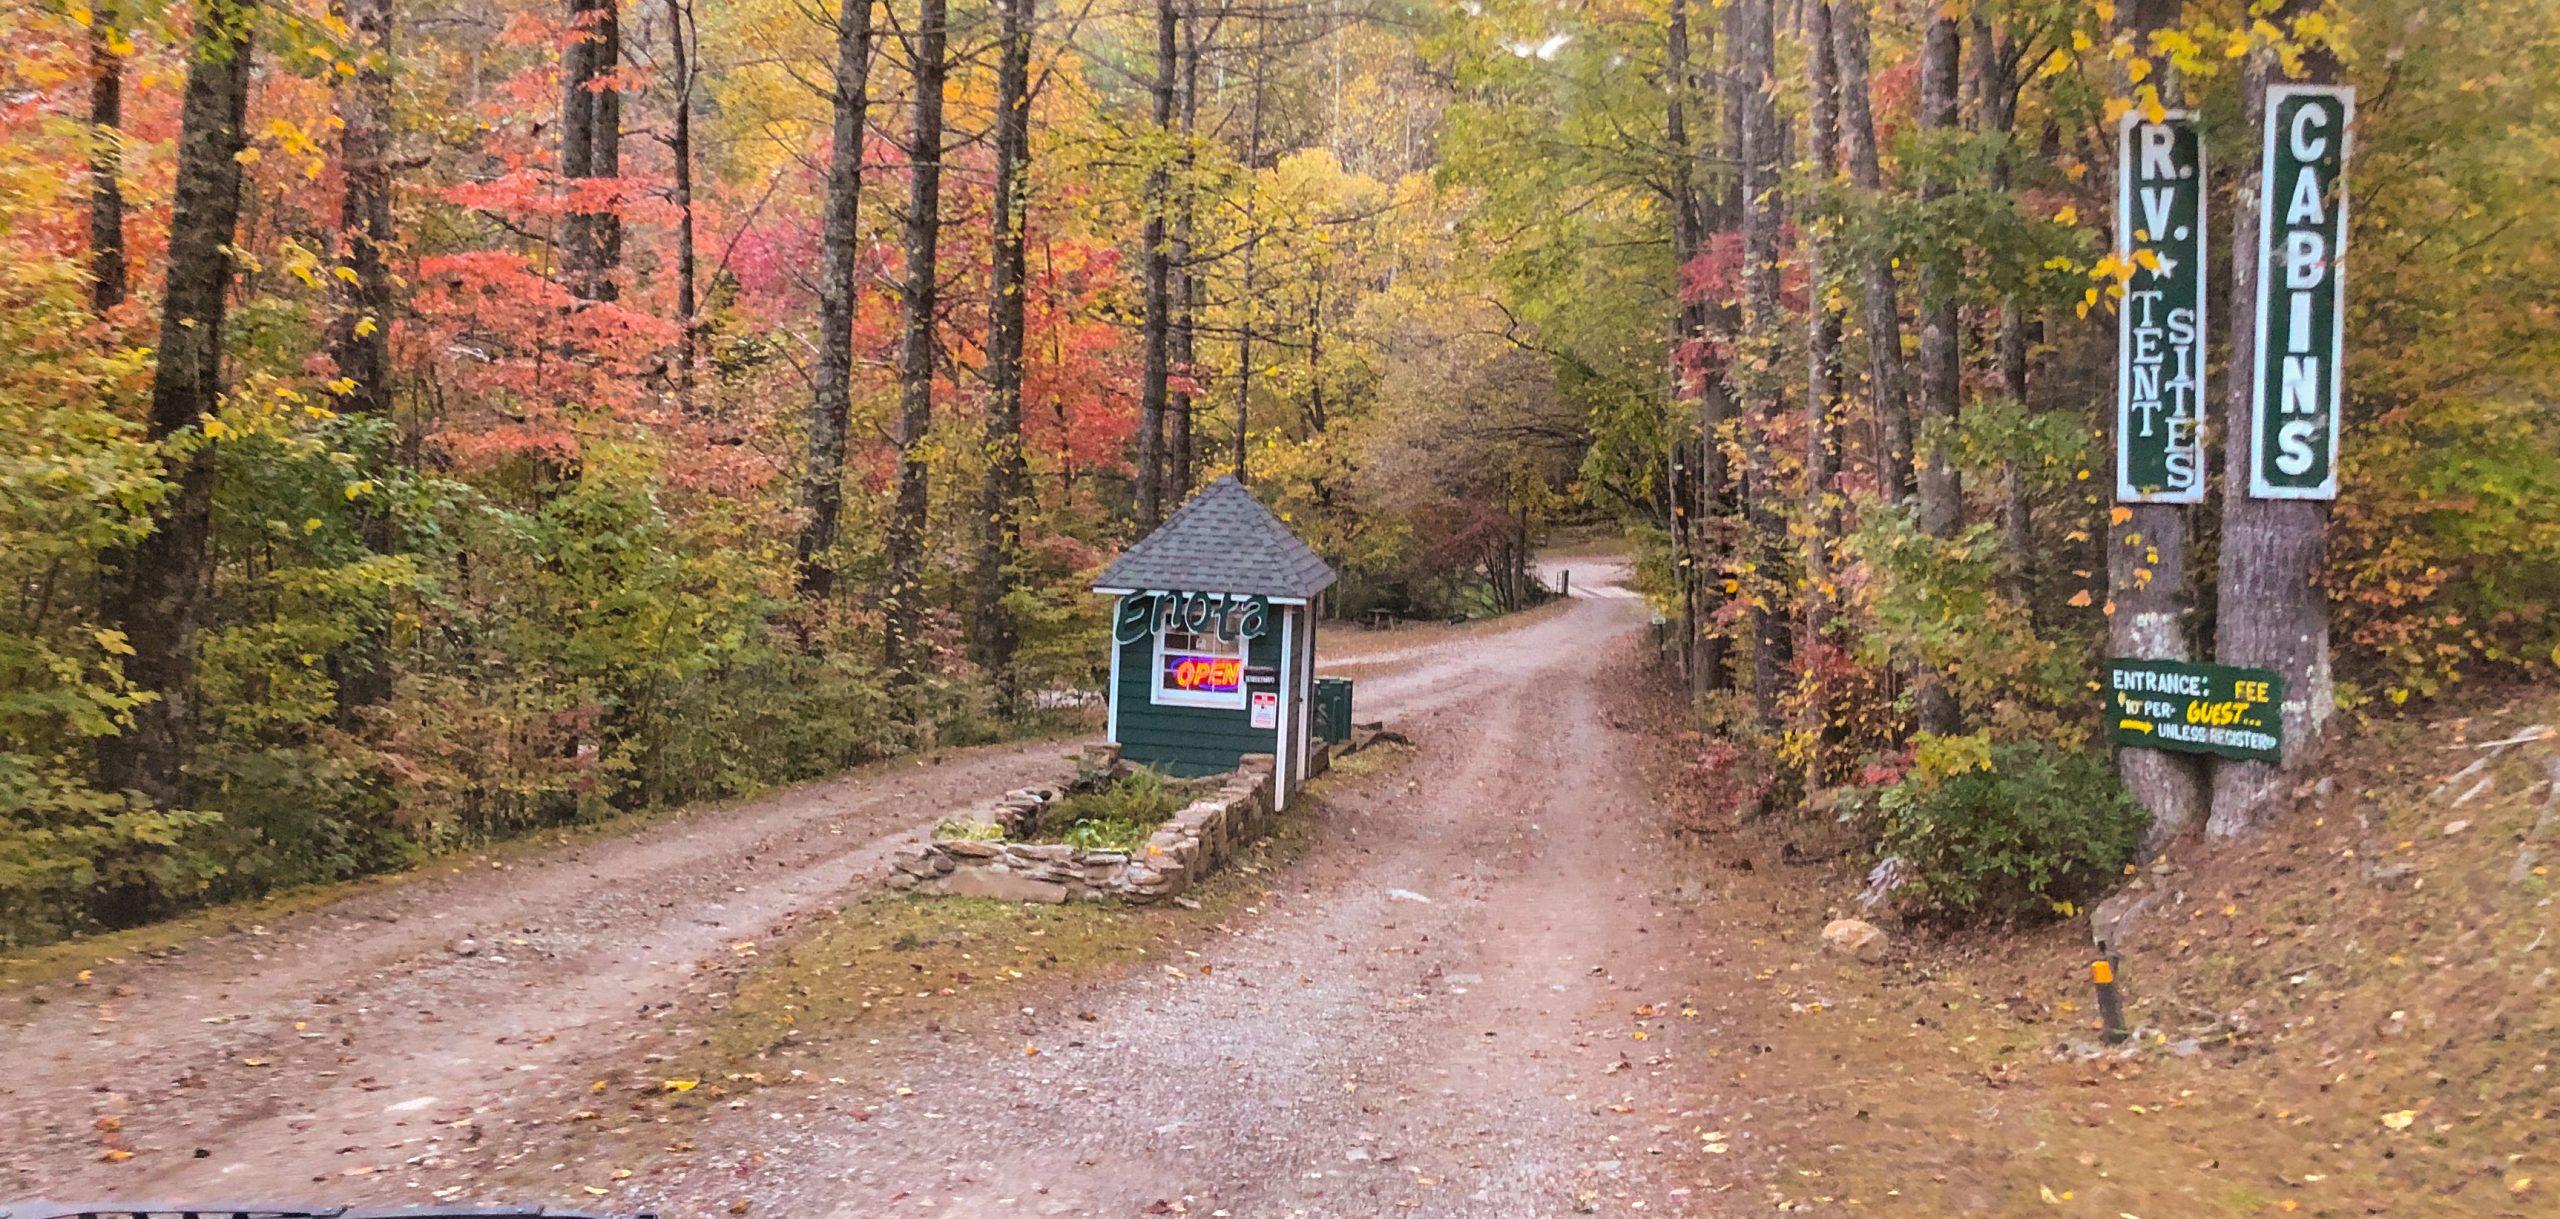 Enota Mountain Retreat Entrance